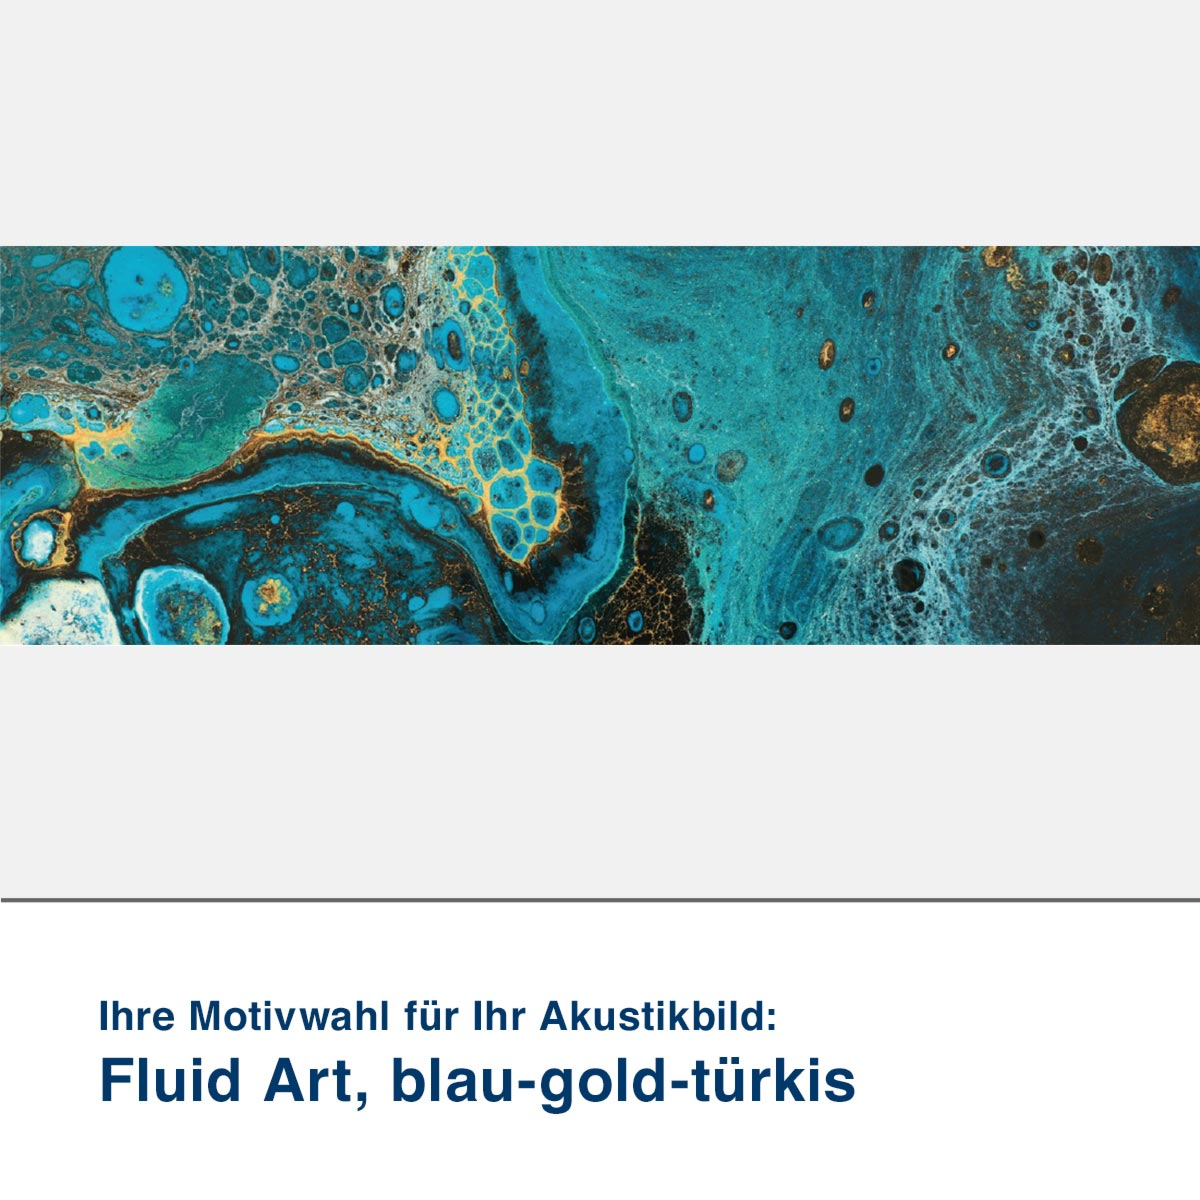 Akustikbild Motiv Fluid Art, blau-gold-türkis